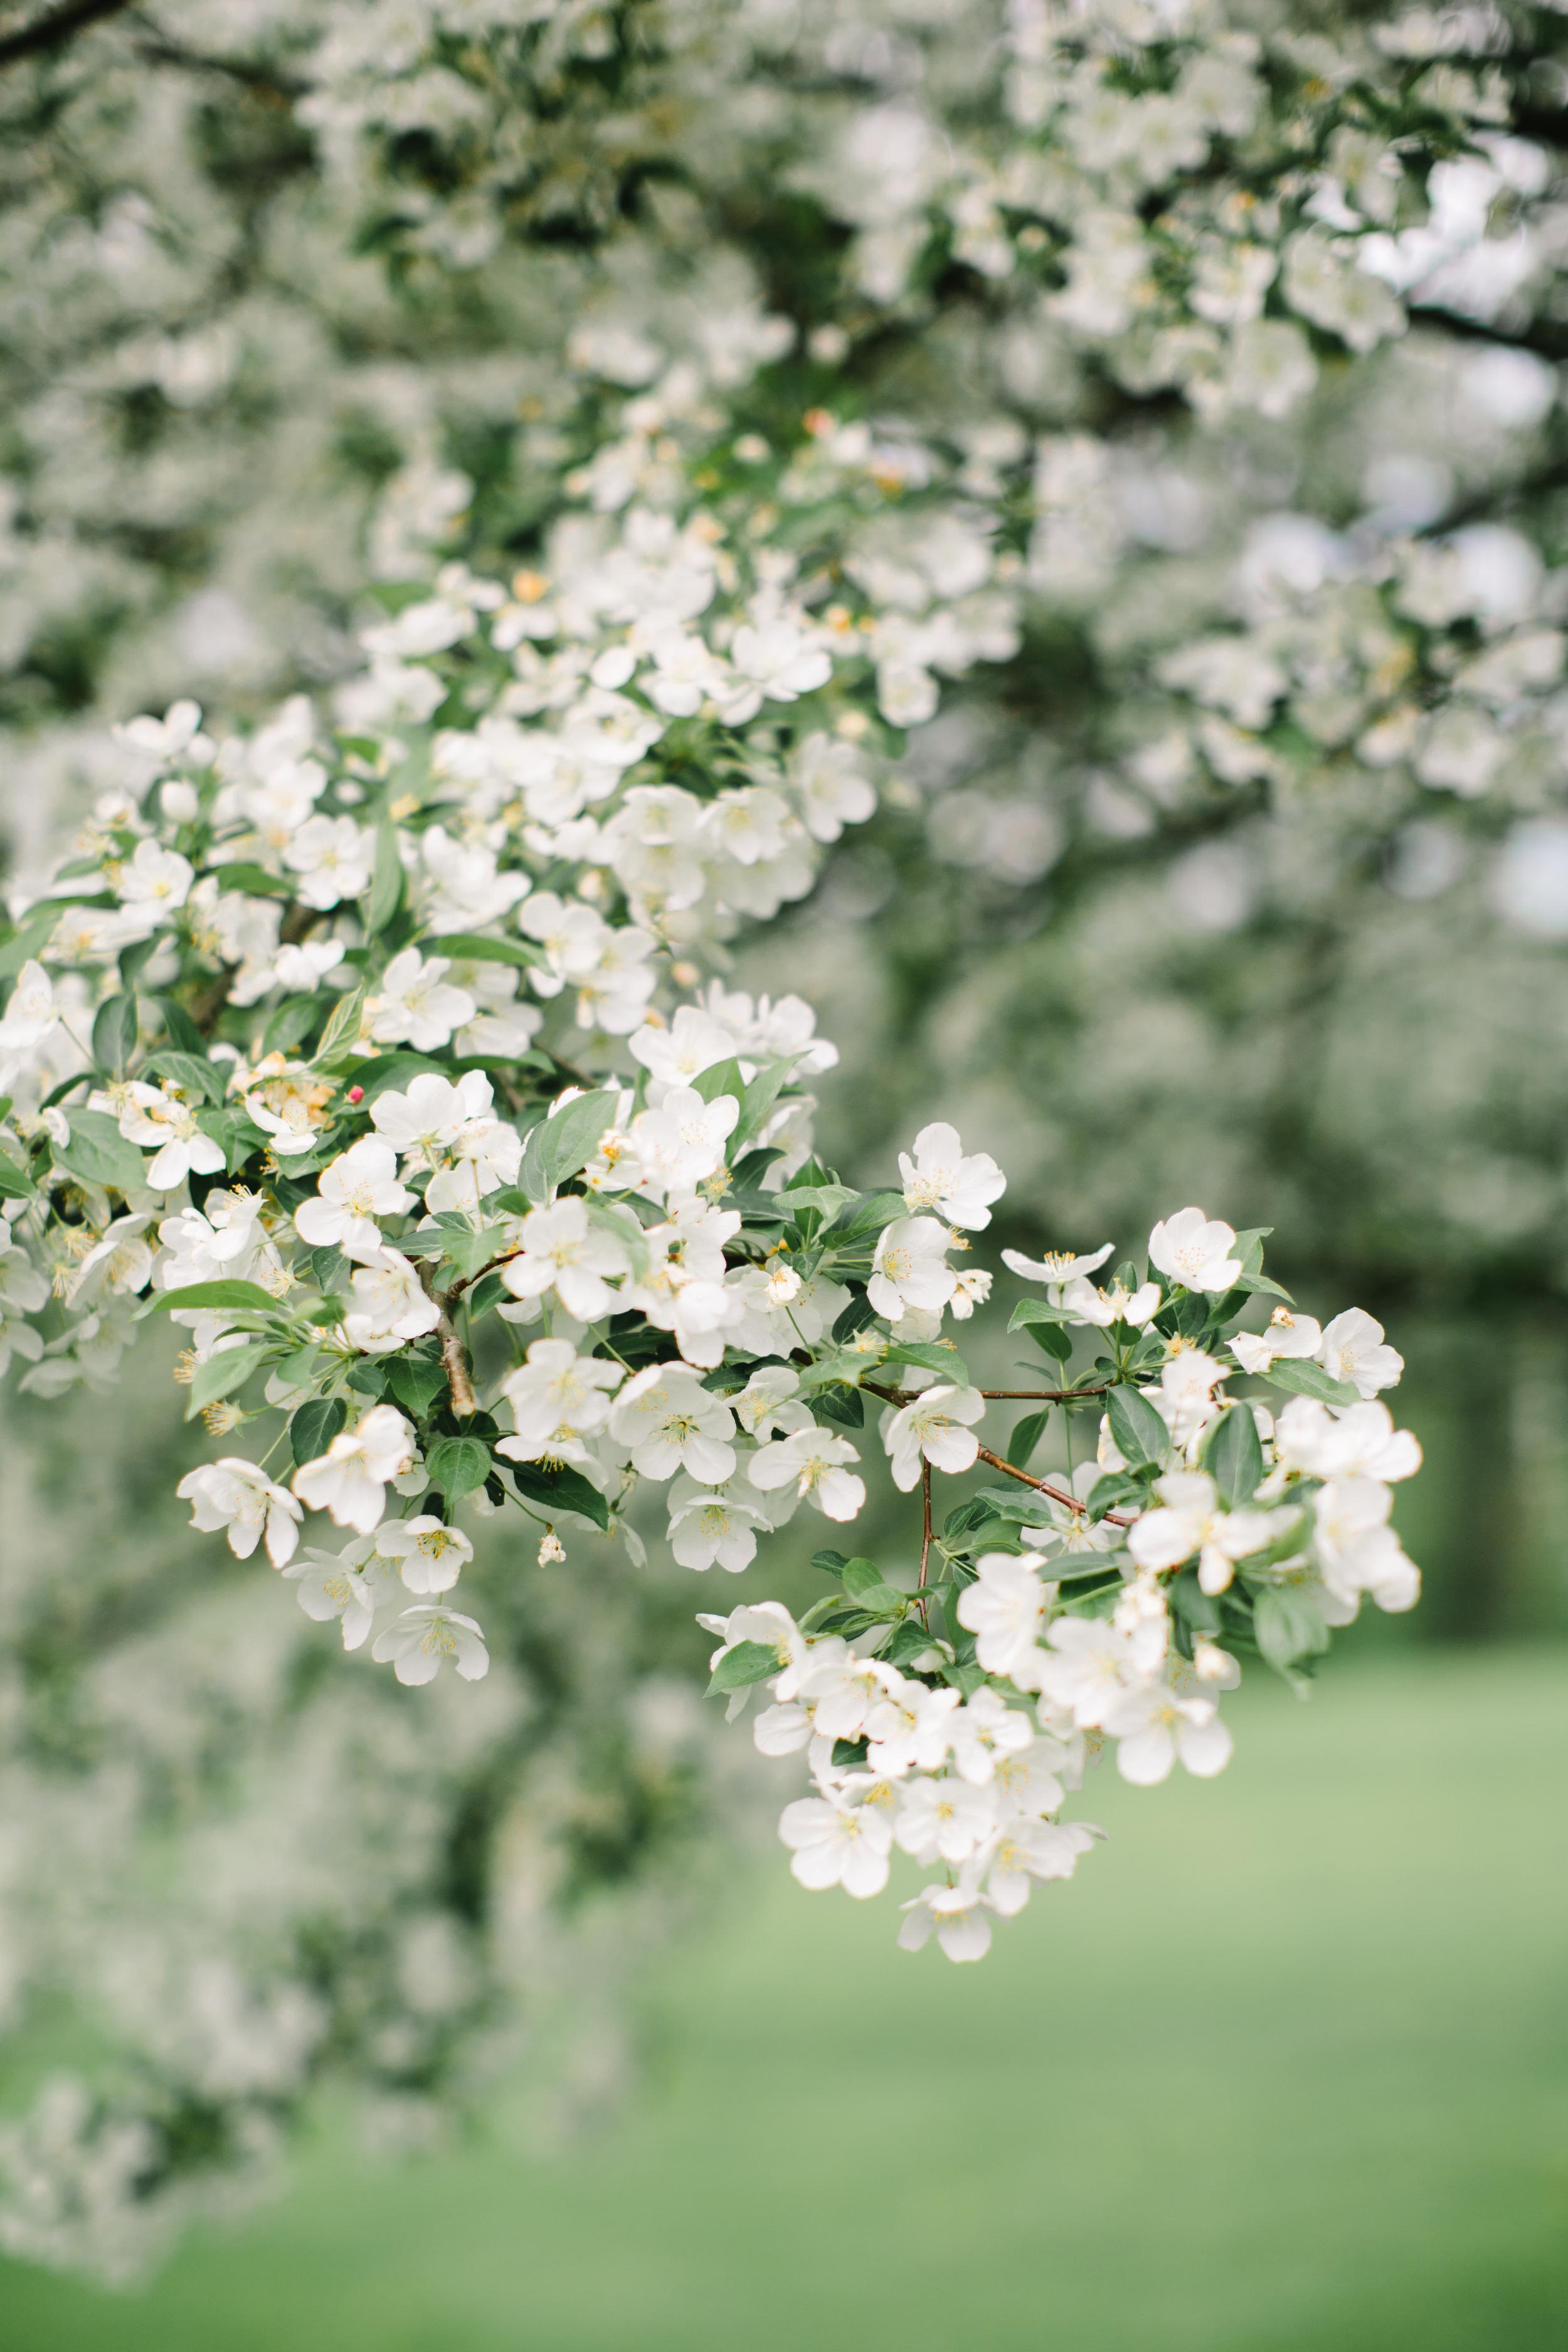 vermont spring apple blossom wedding inspiration